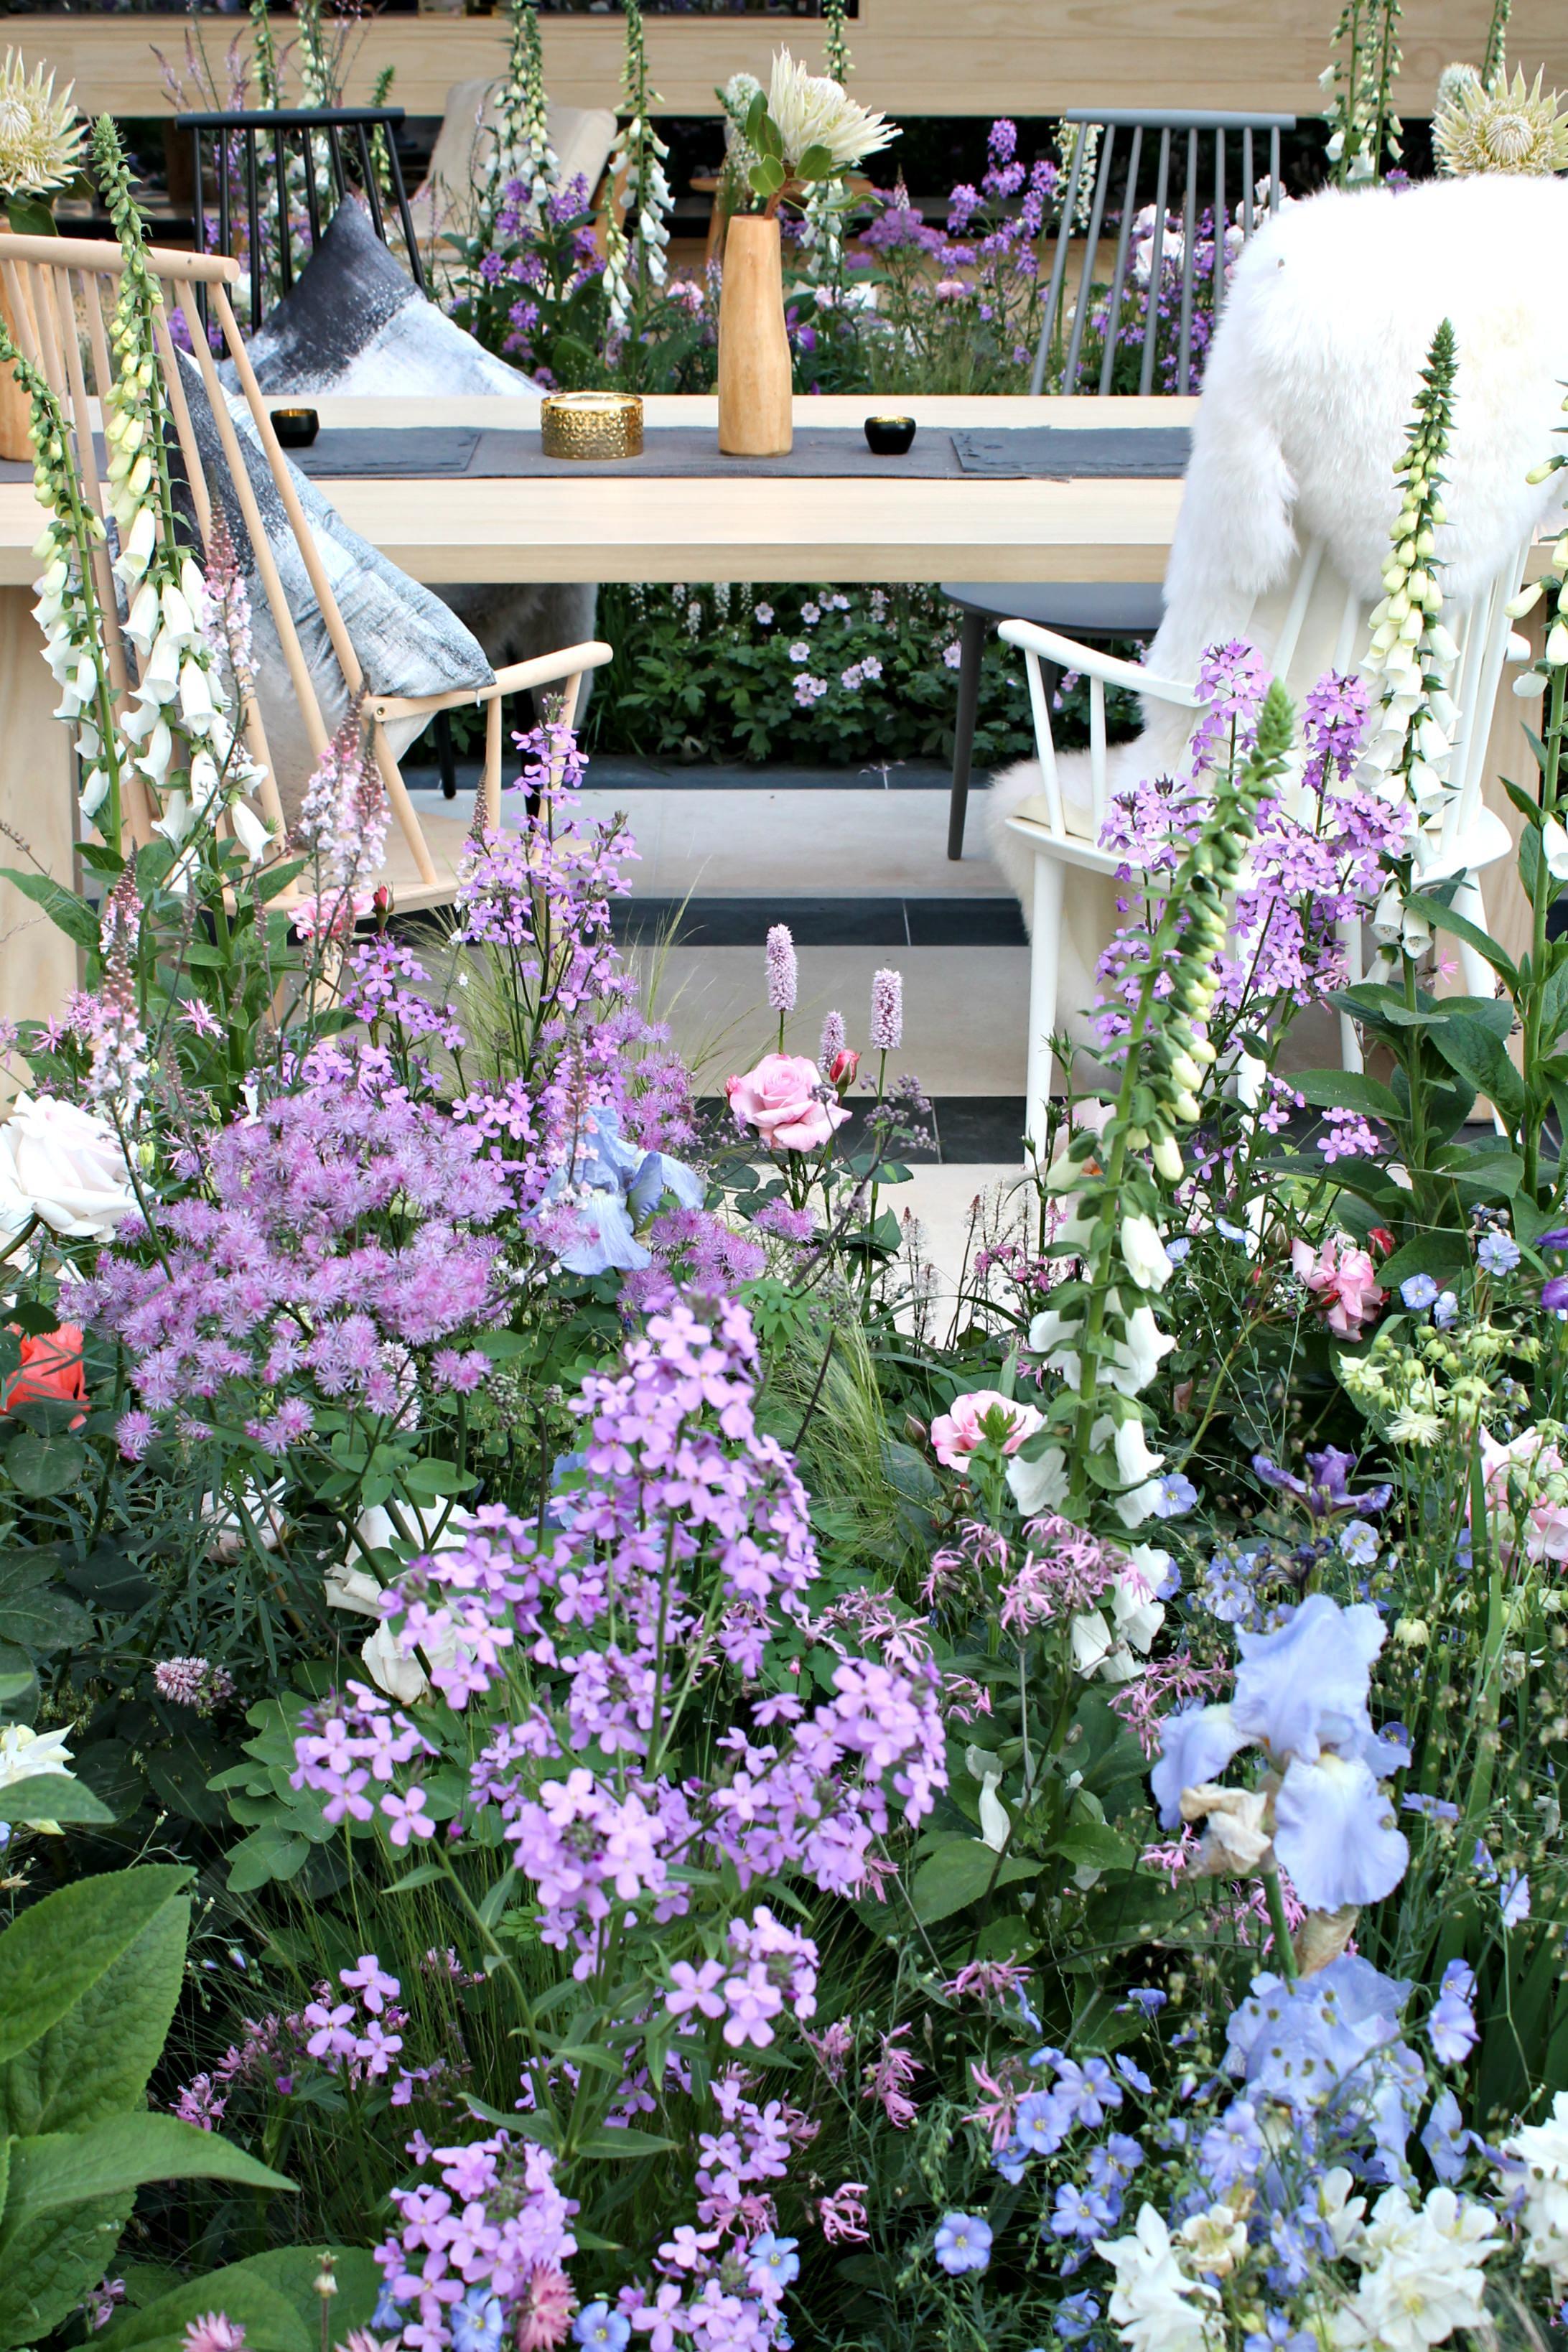 LG-garden-Chelsea-flower-show-photo-by-Little-Big-Bell